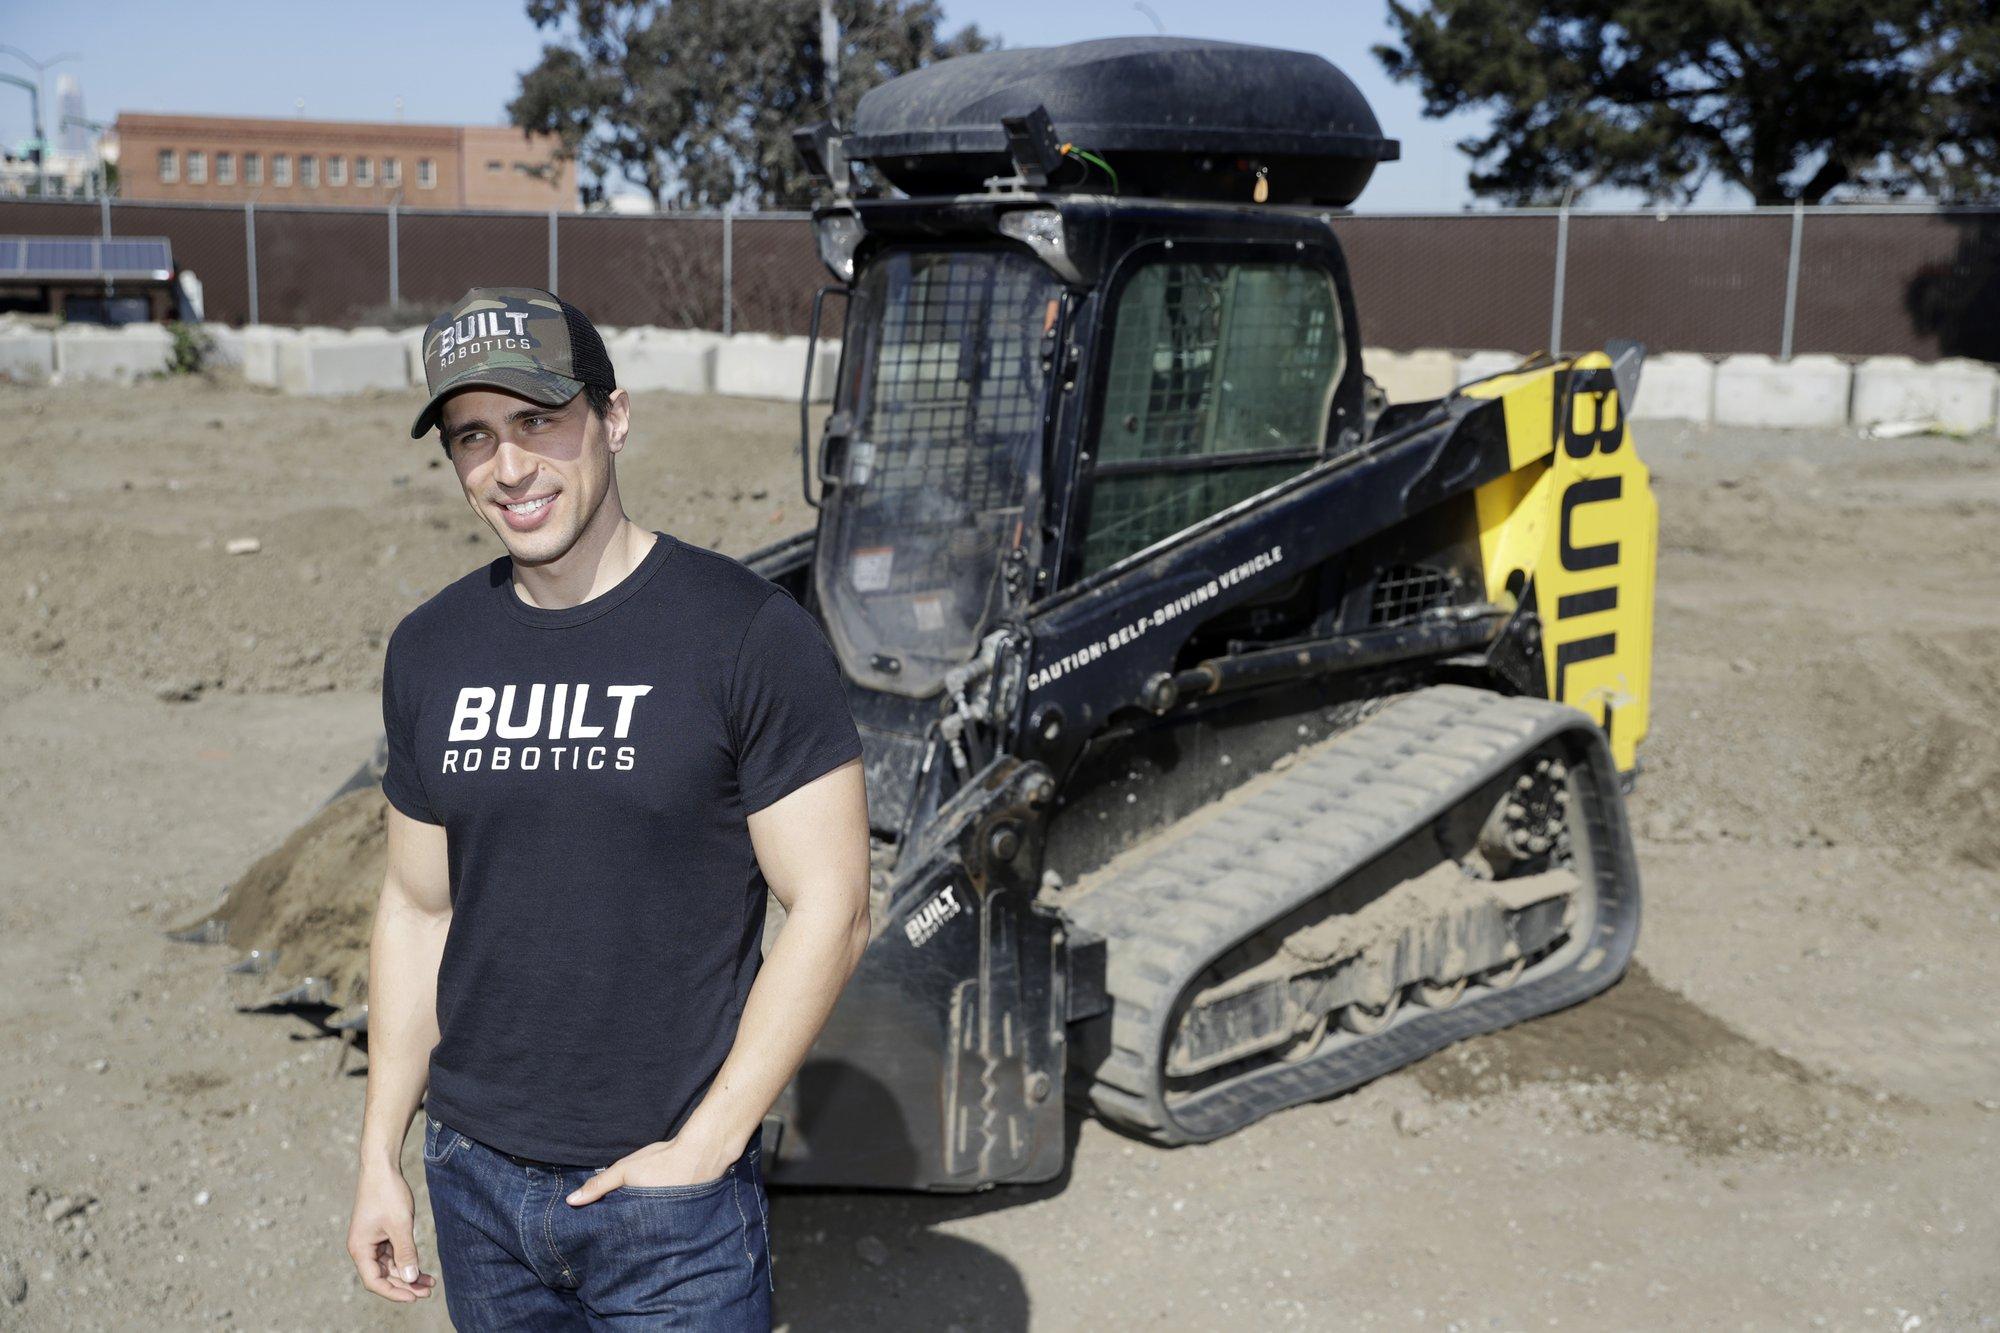 Robots break new ground in construction industry